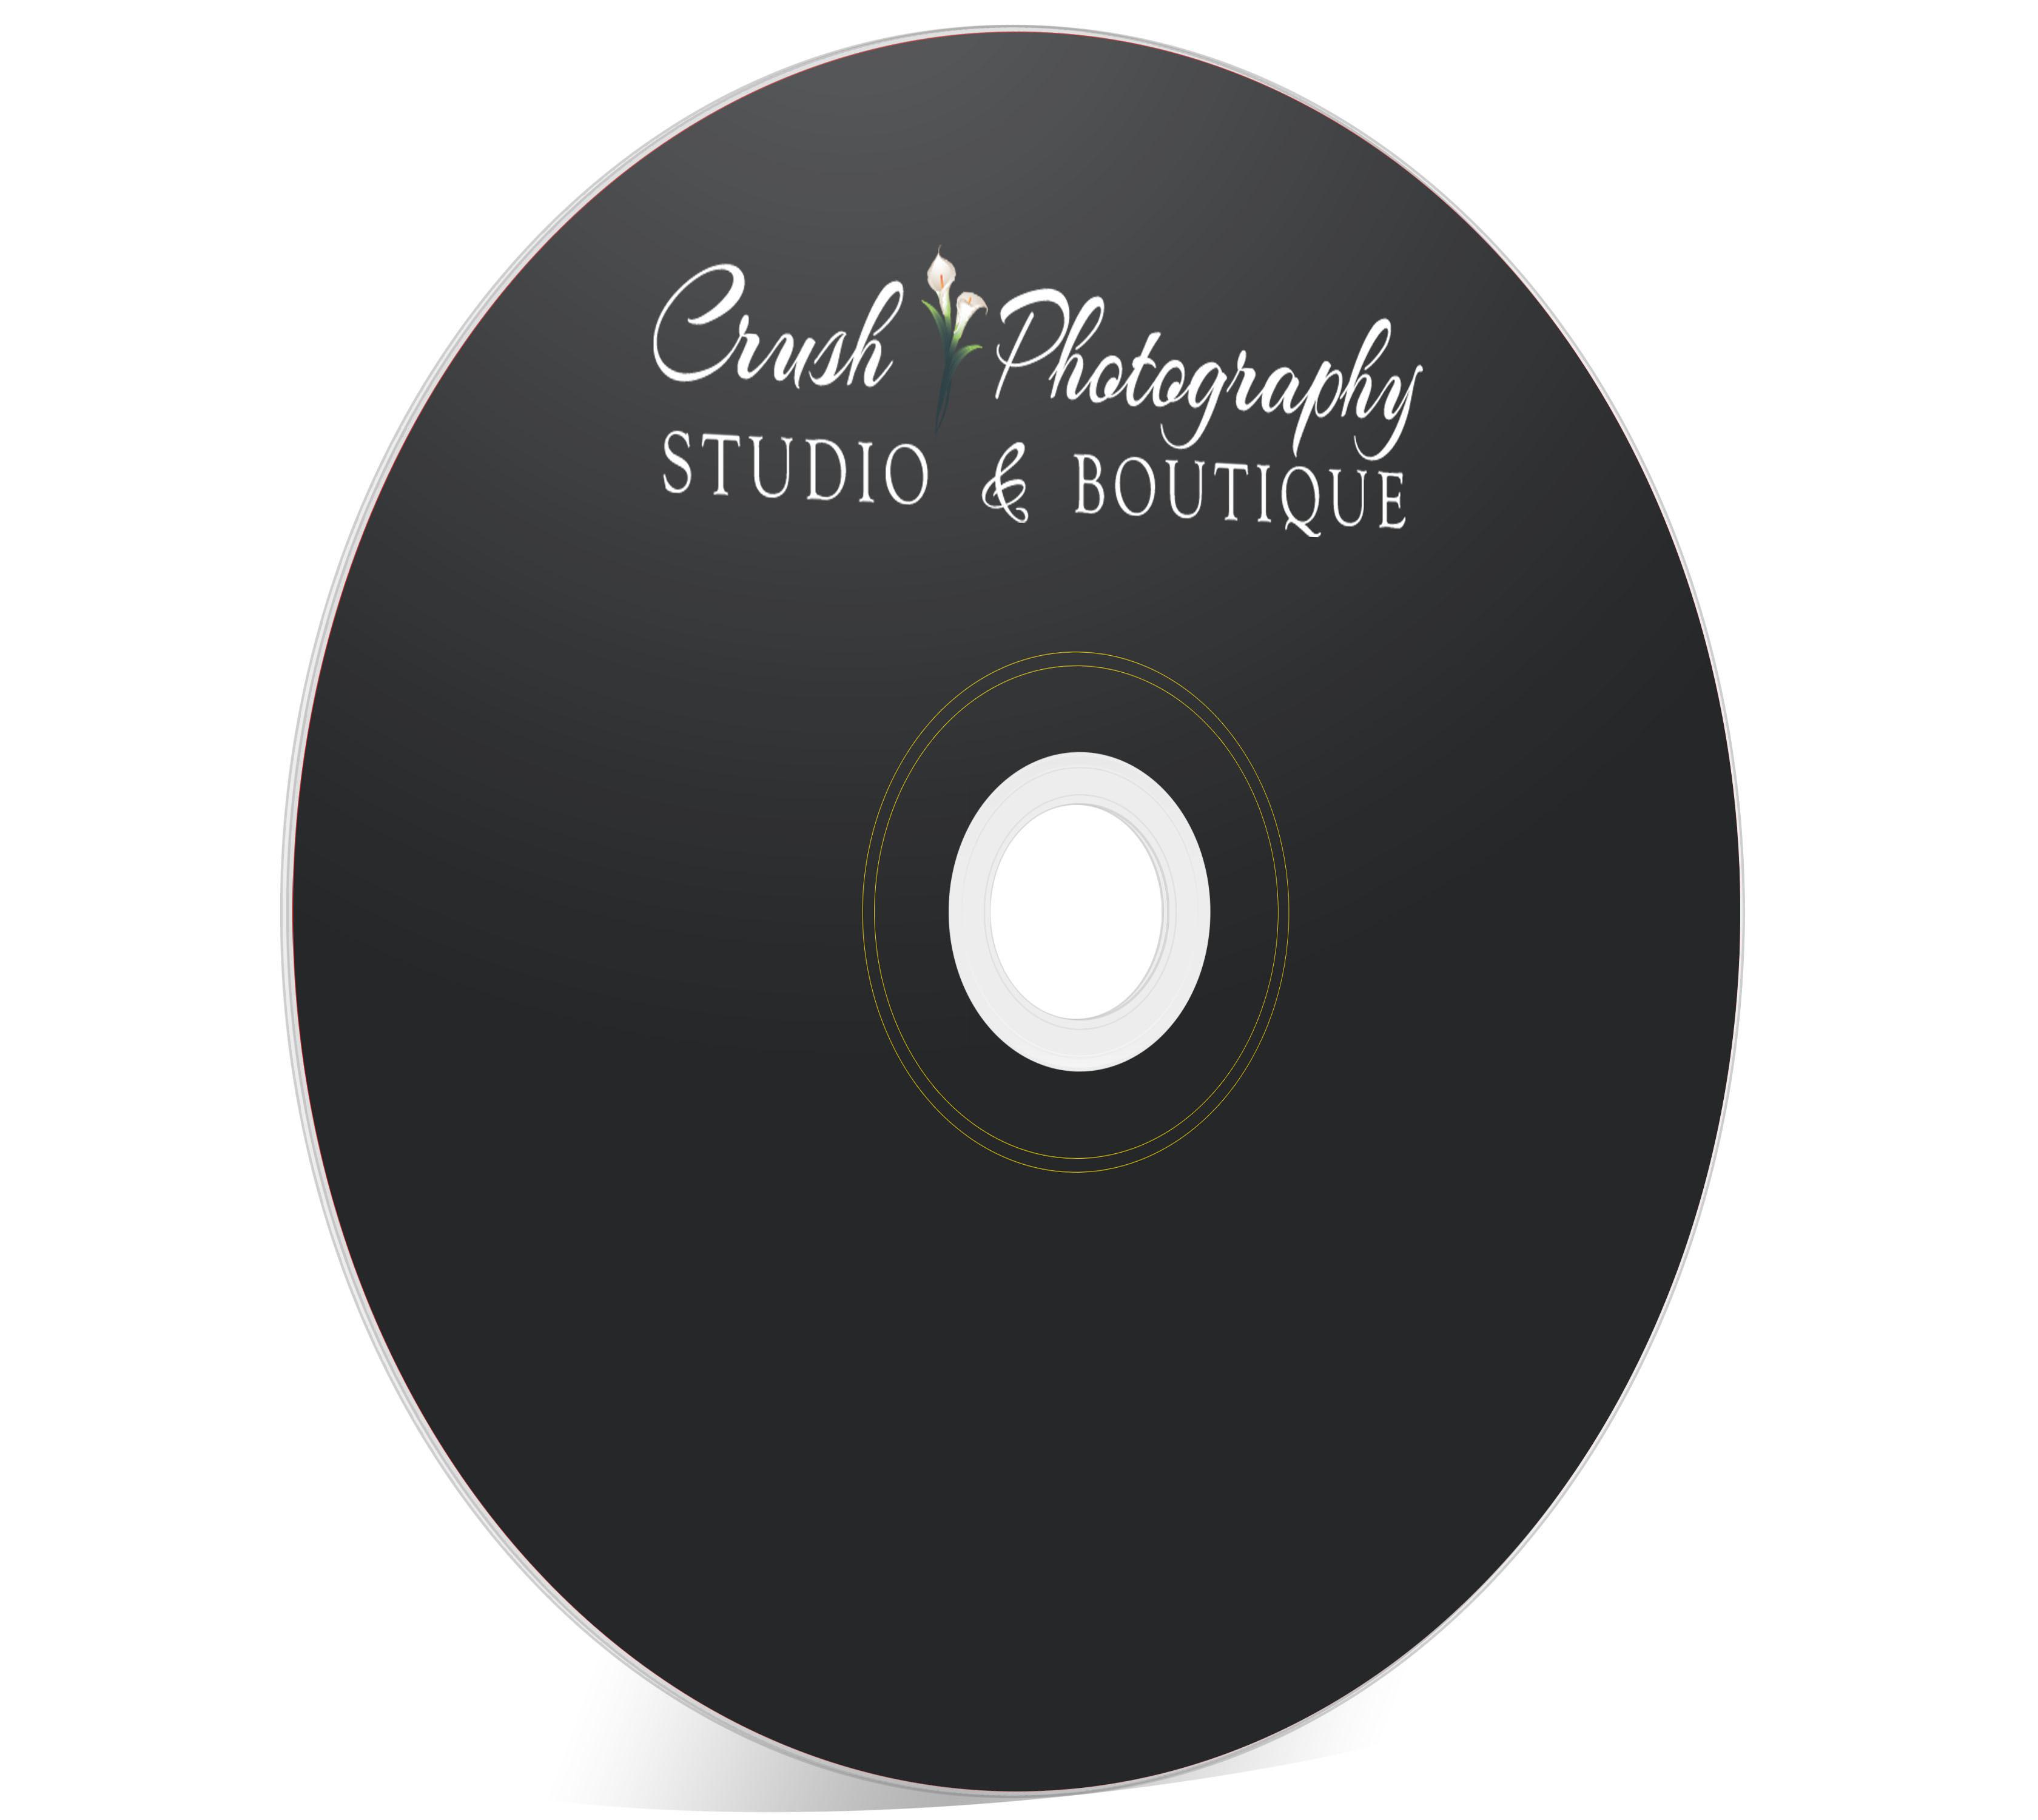 Session DVD crushDVD